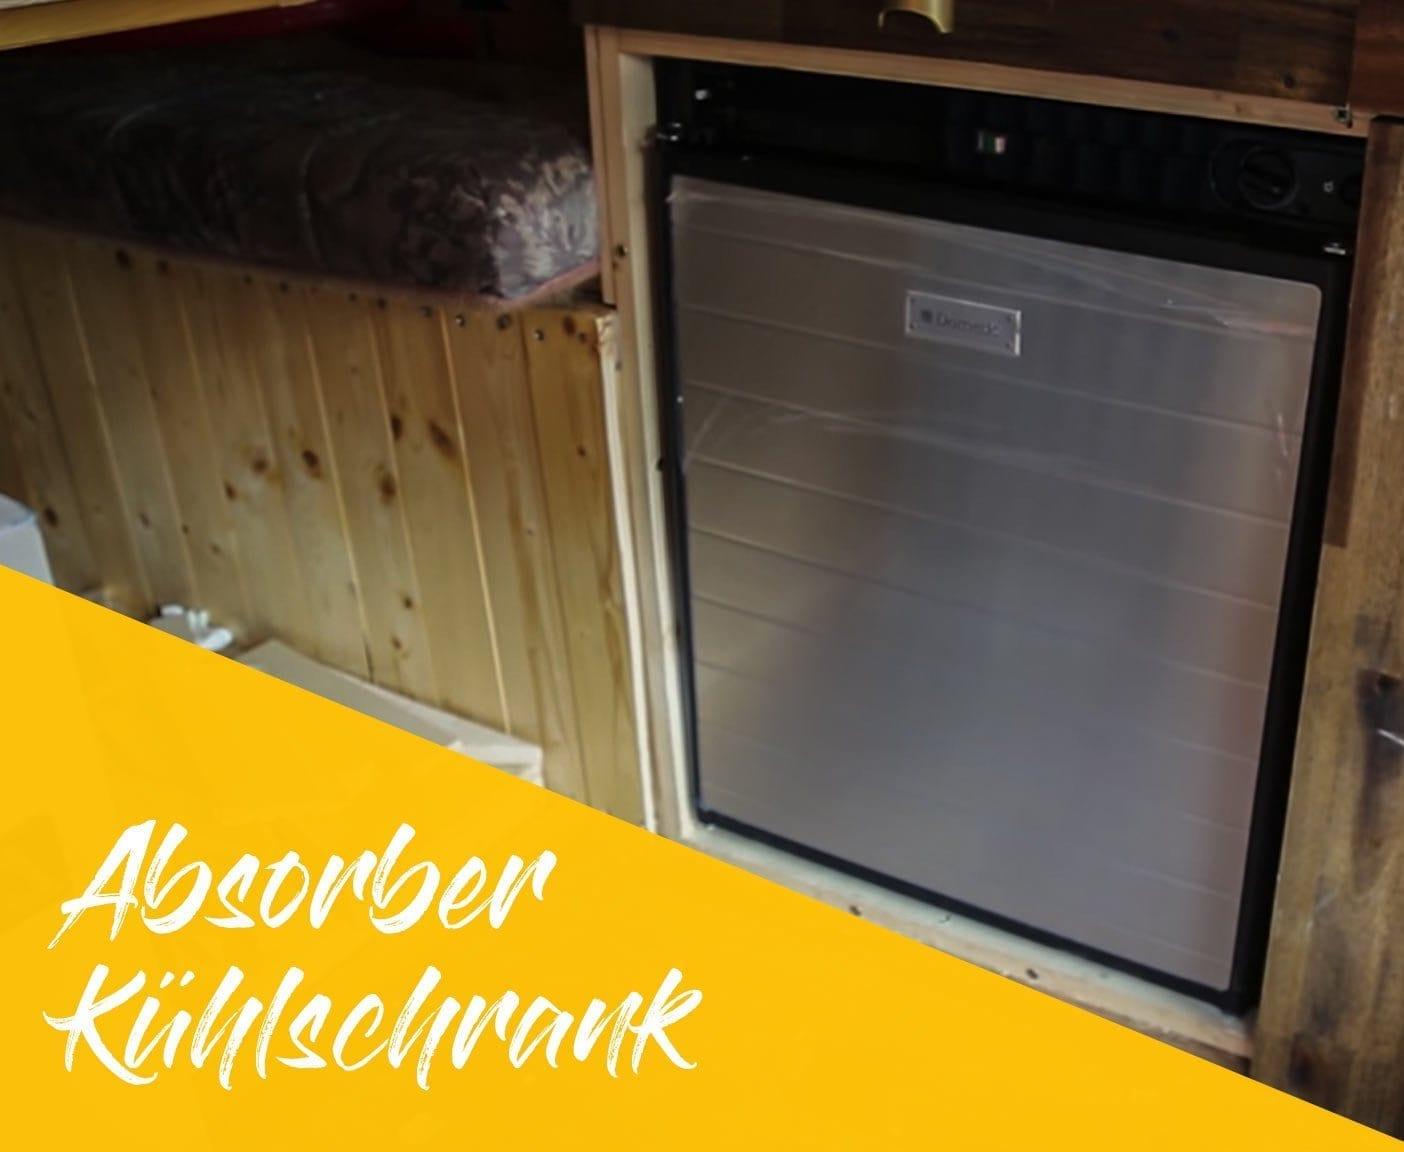 Bomann Kühlschrank Schaltet Nicht Ab : Kompressor oder absorber v camping kühlschrank im test